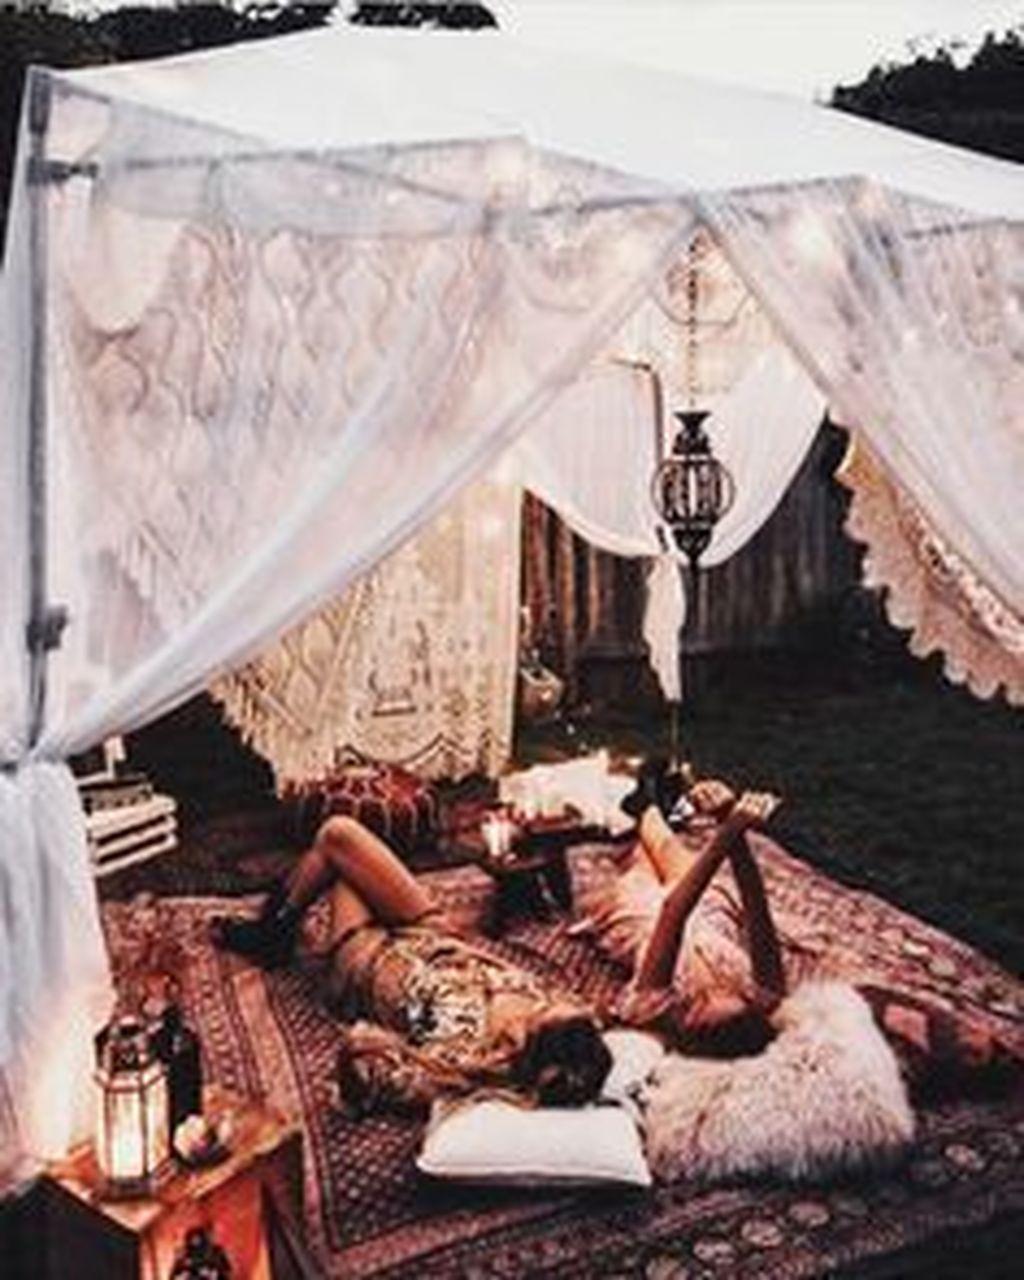 The Best Romantic Backyard Decorating Ideas 12